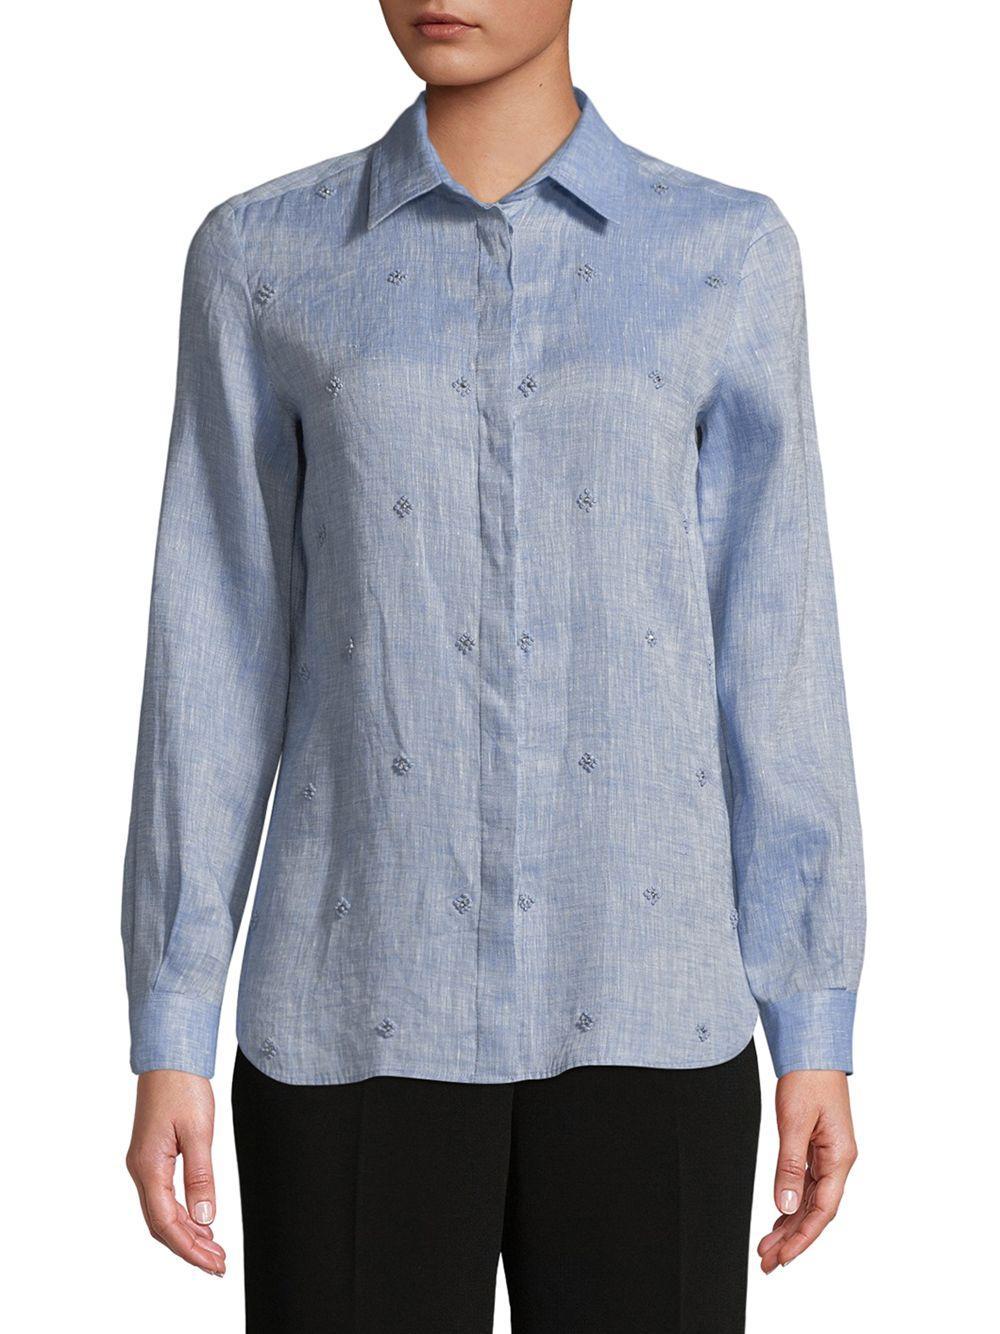 8966b9e72fbe Lyst - Max Mara Vallet Embellished Linen Shirt in Blue